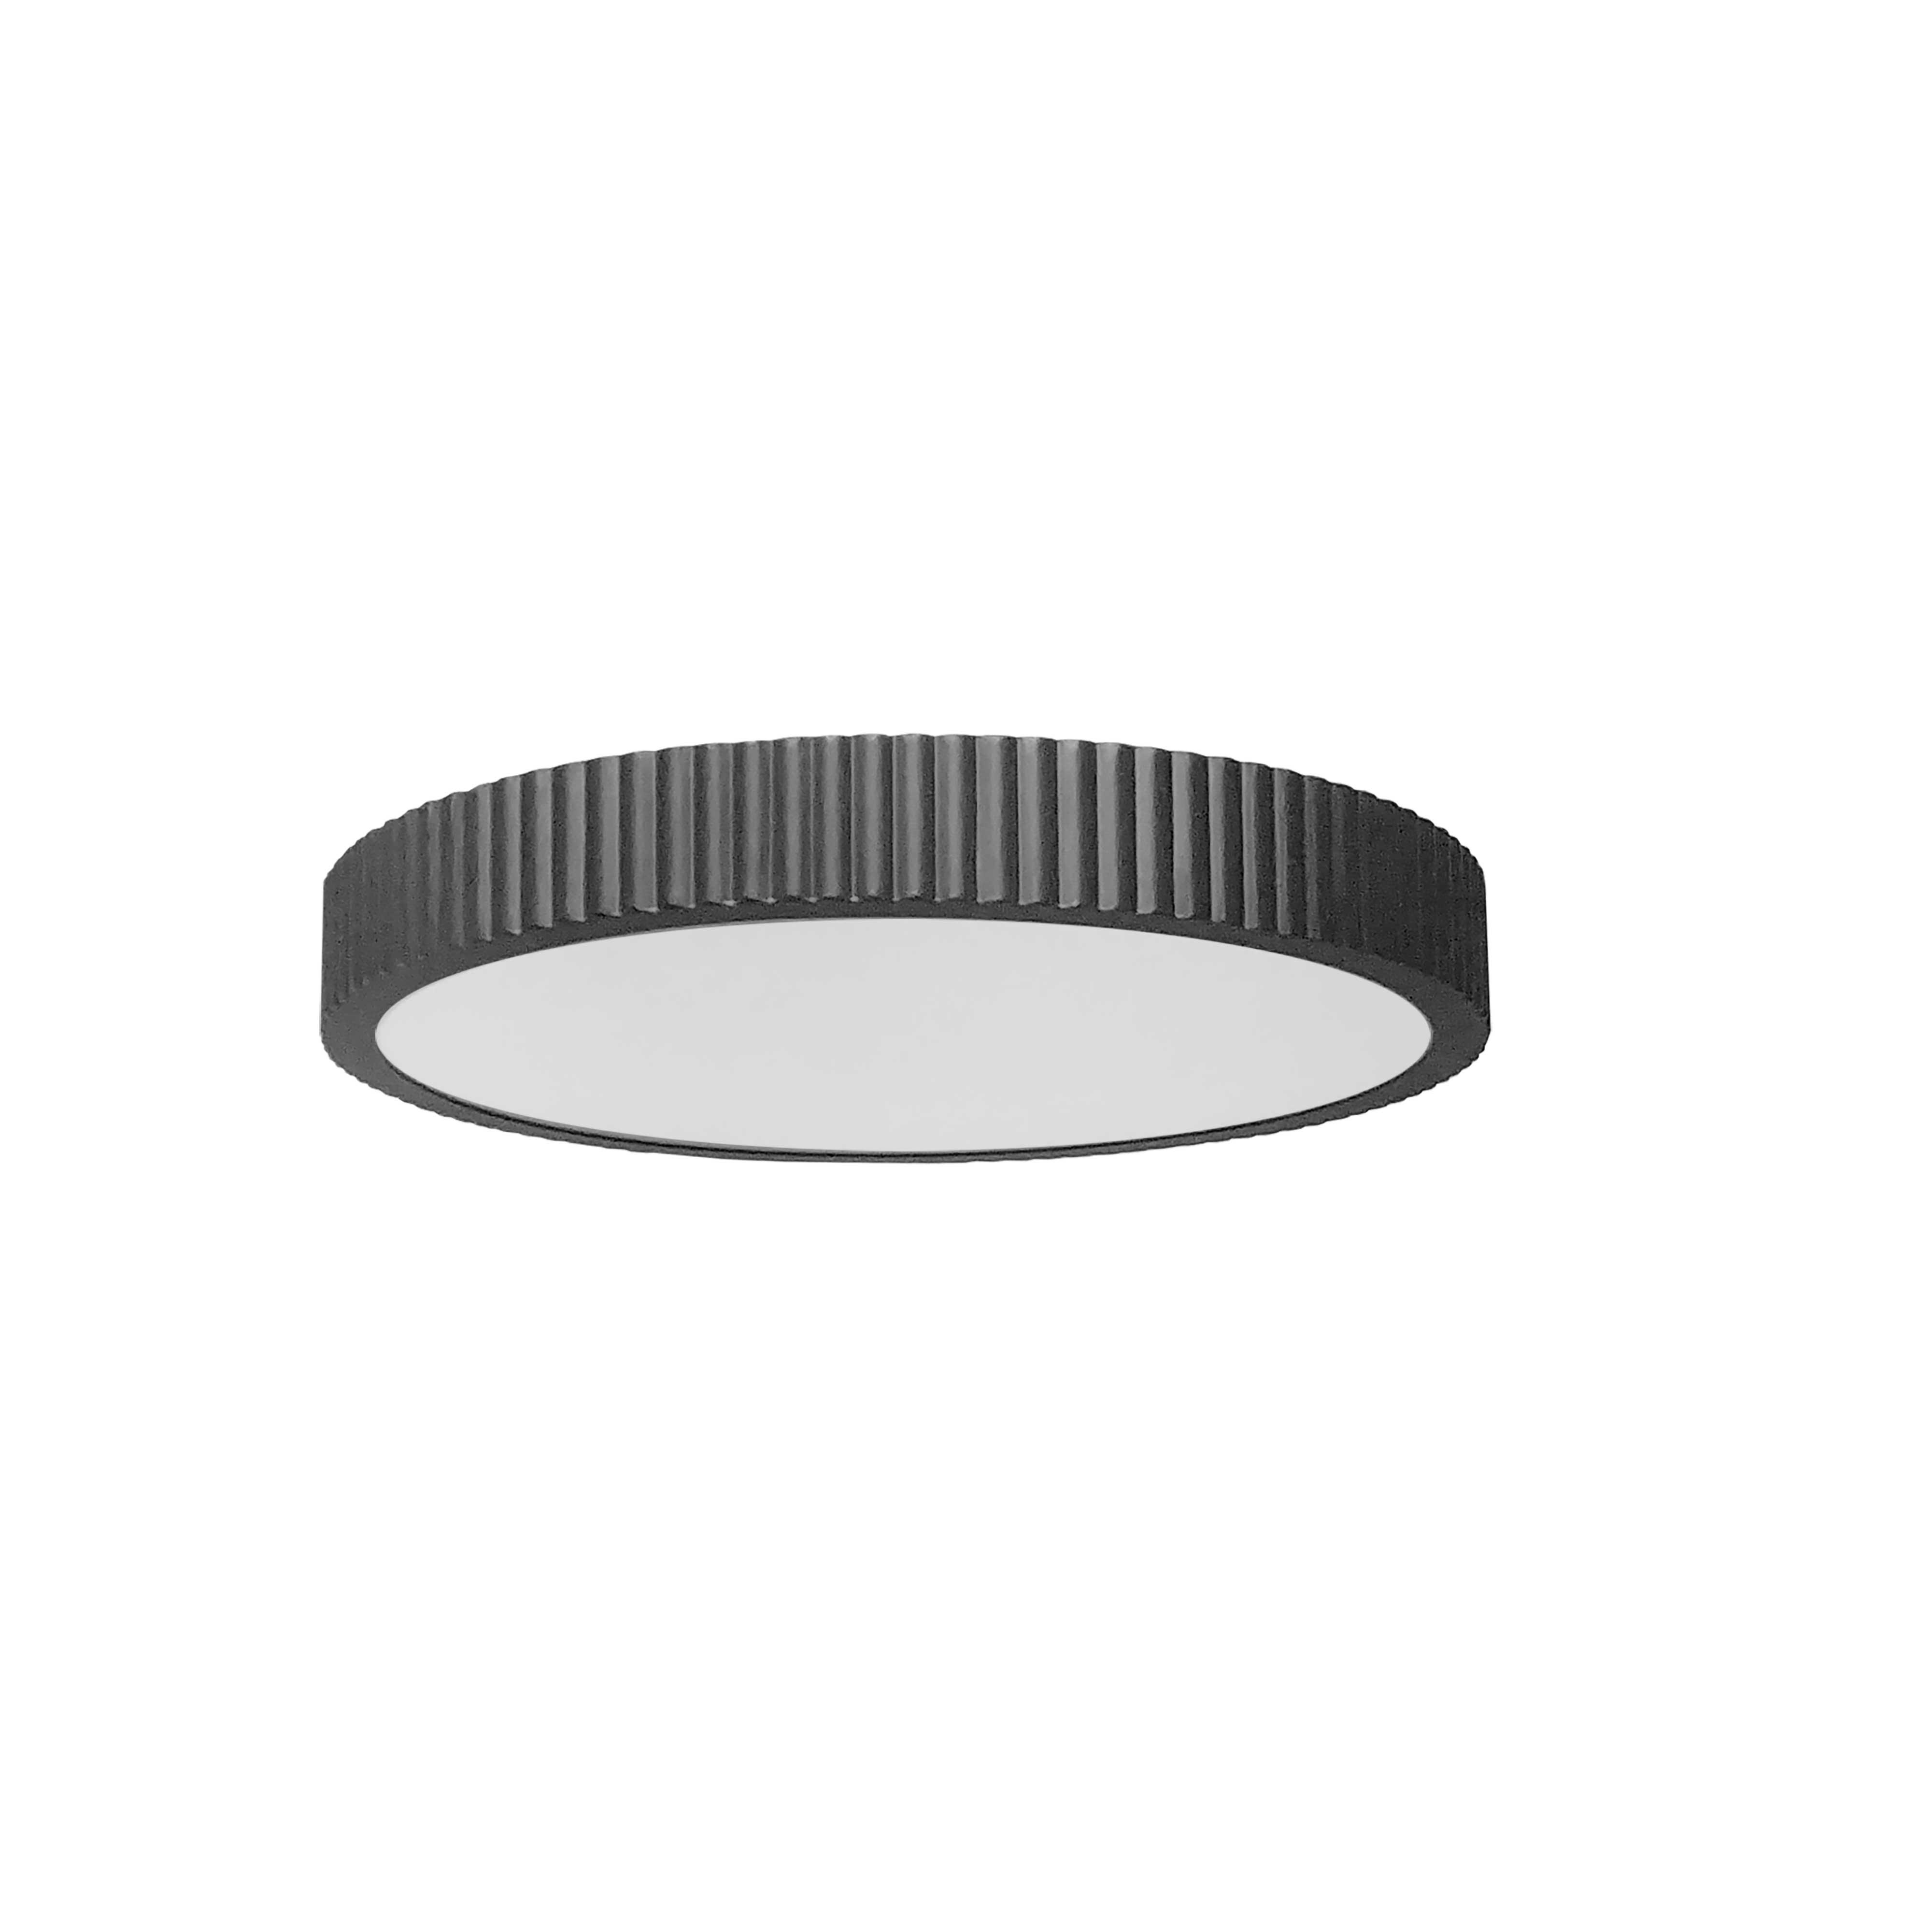 30W LED Flush mount, Matte Black with White Acrylic Diffuser